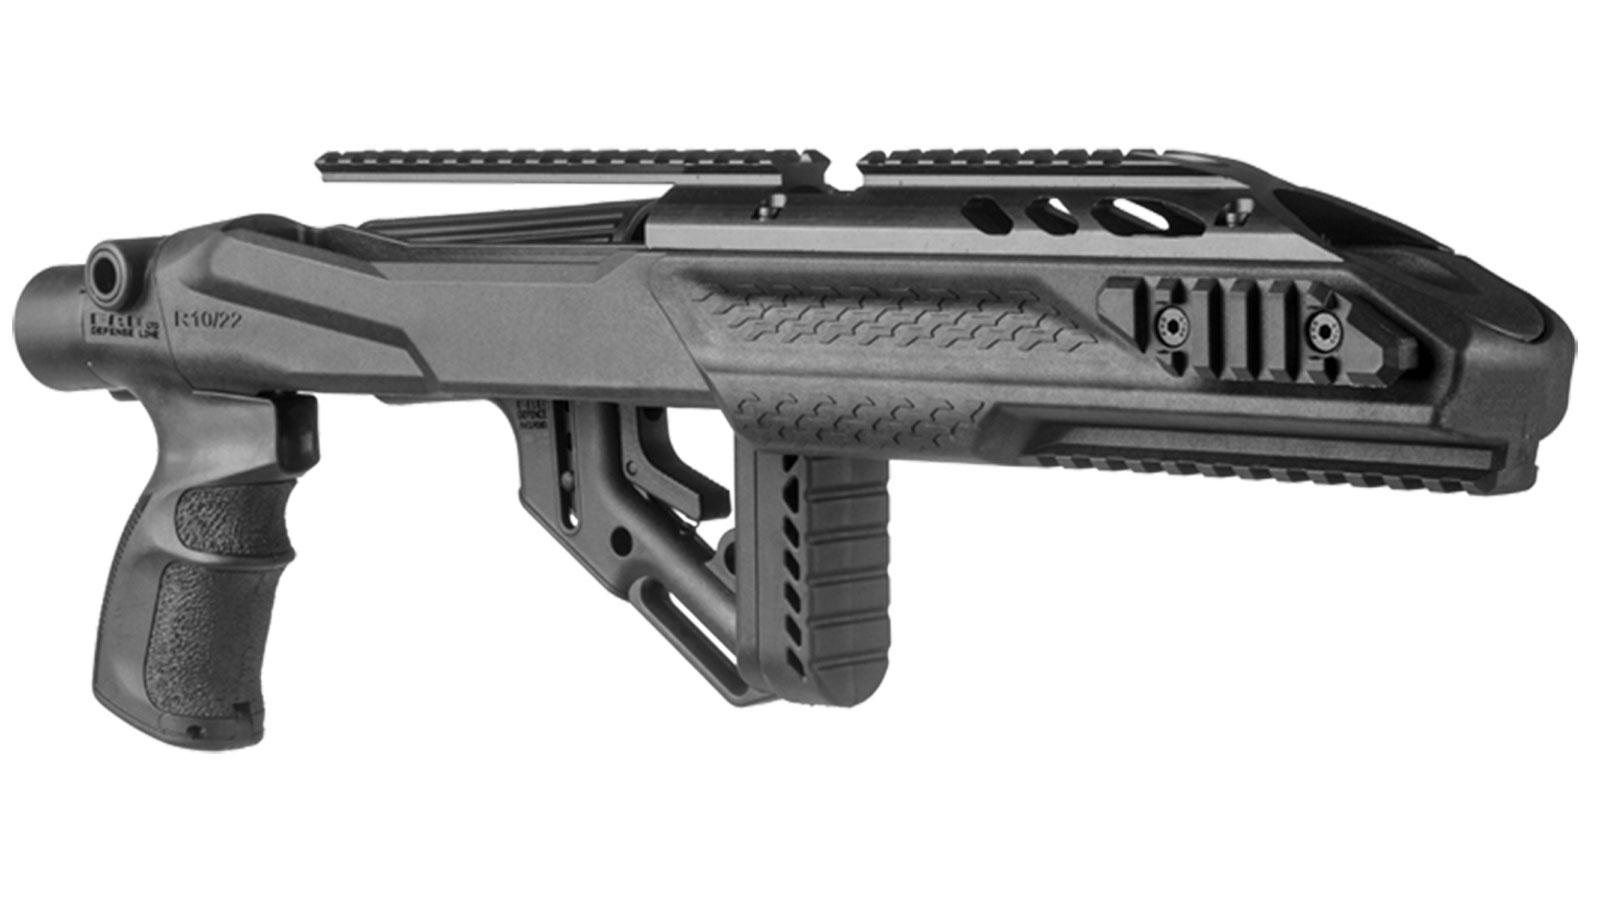 Mako UAS PRO R10 22 UAS Precision Stock Pro Kit Ruger 10 22